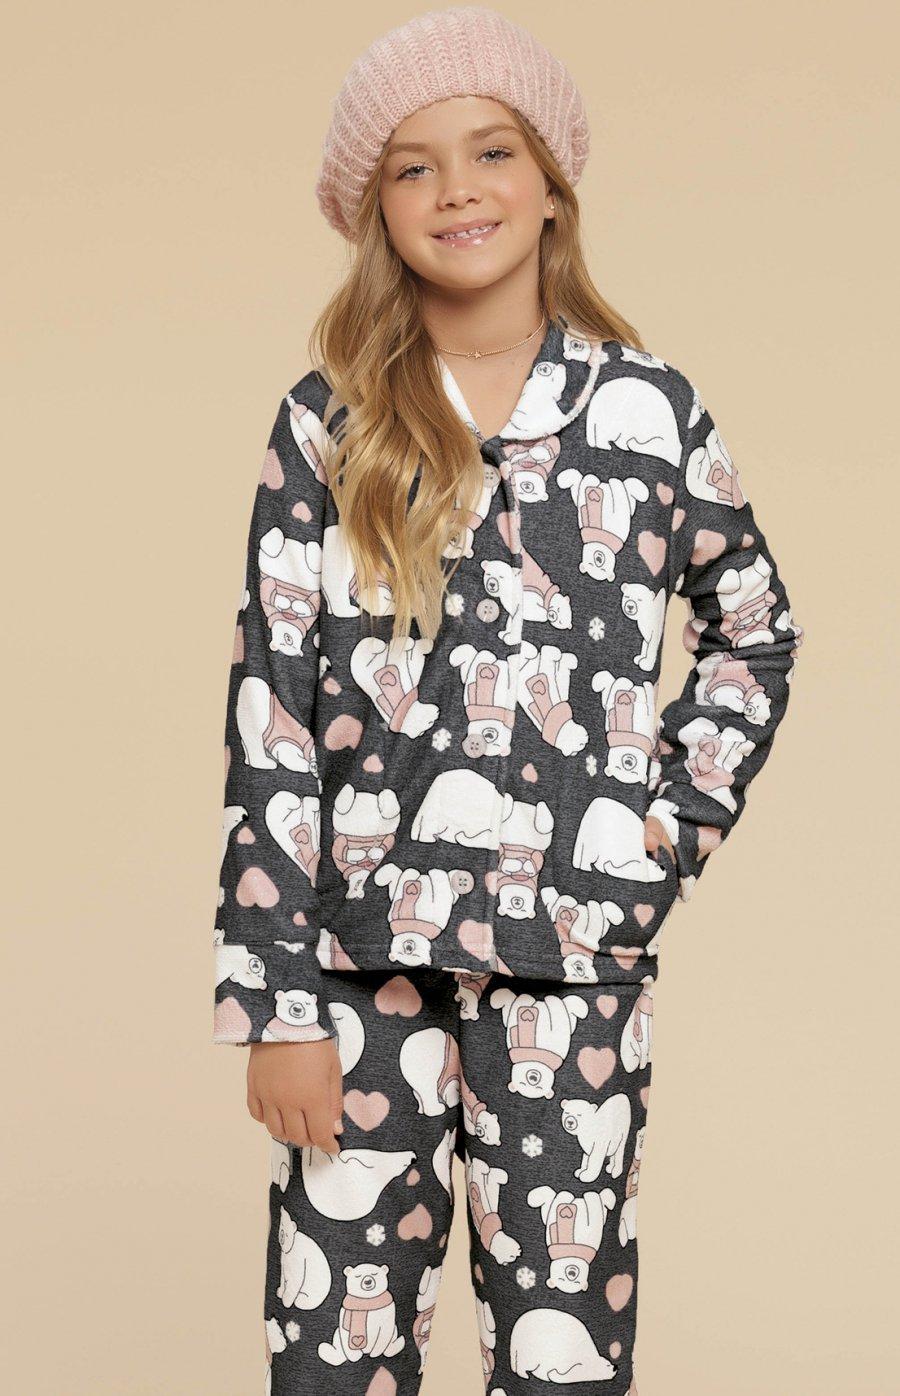 Pijama Infantil Soft Urso Fofolete Inverno 2019 PROMO